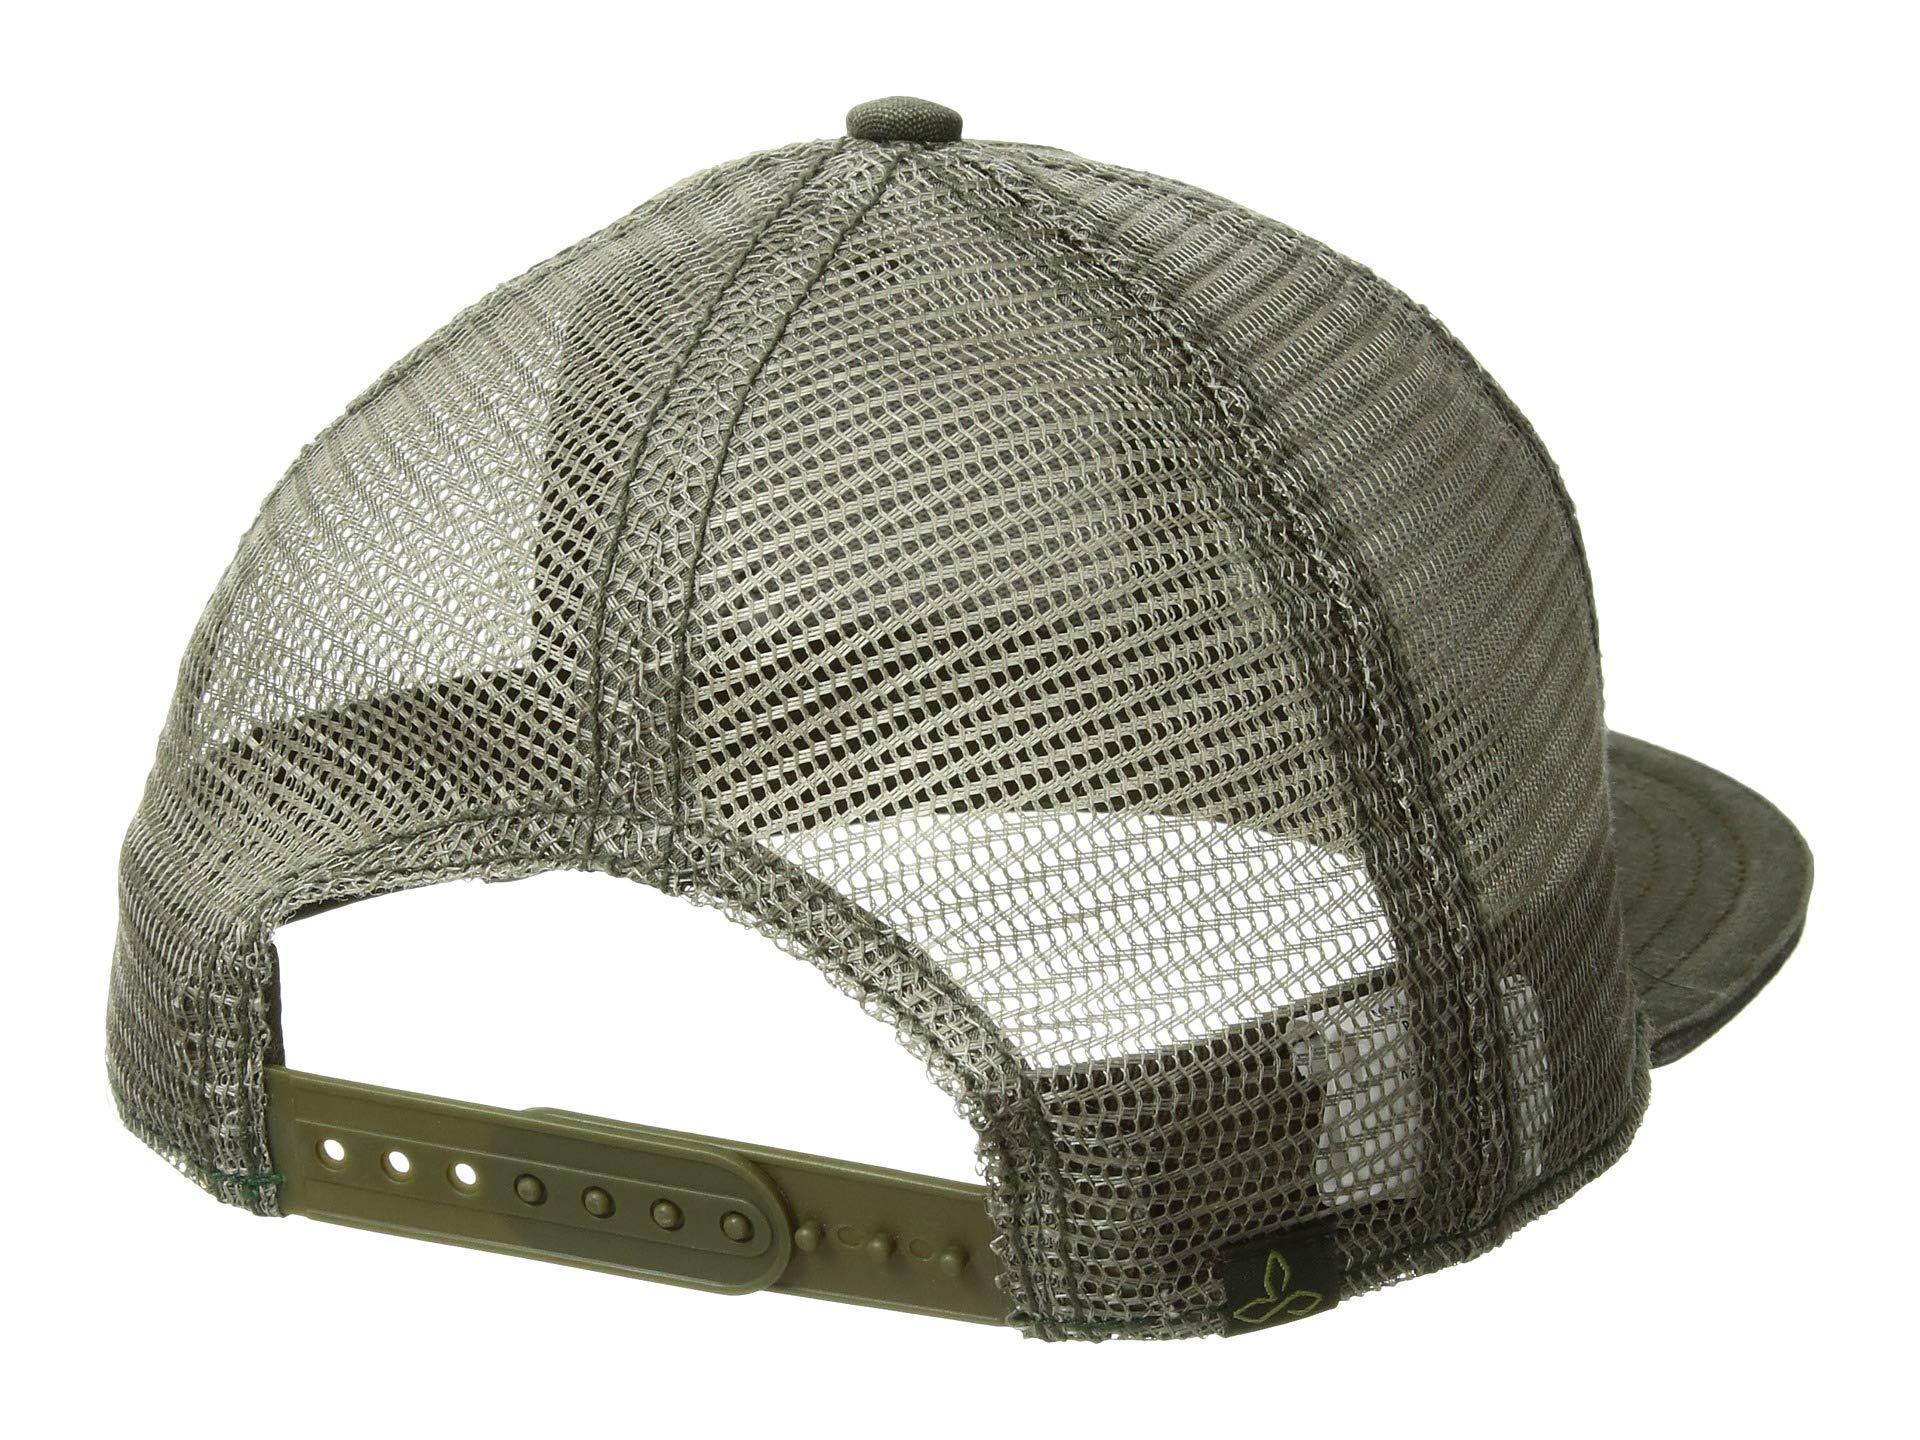 Prana - Karma Trucker Hat (cargo Green) Caps for Men - Lyst. View fullscreen a959f64c2ec0